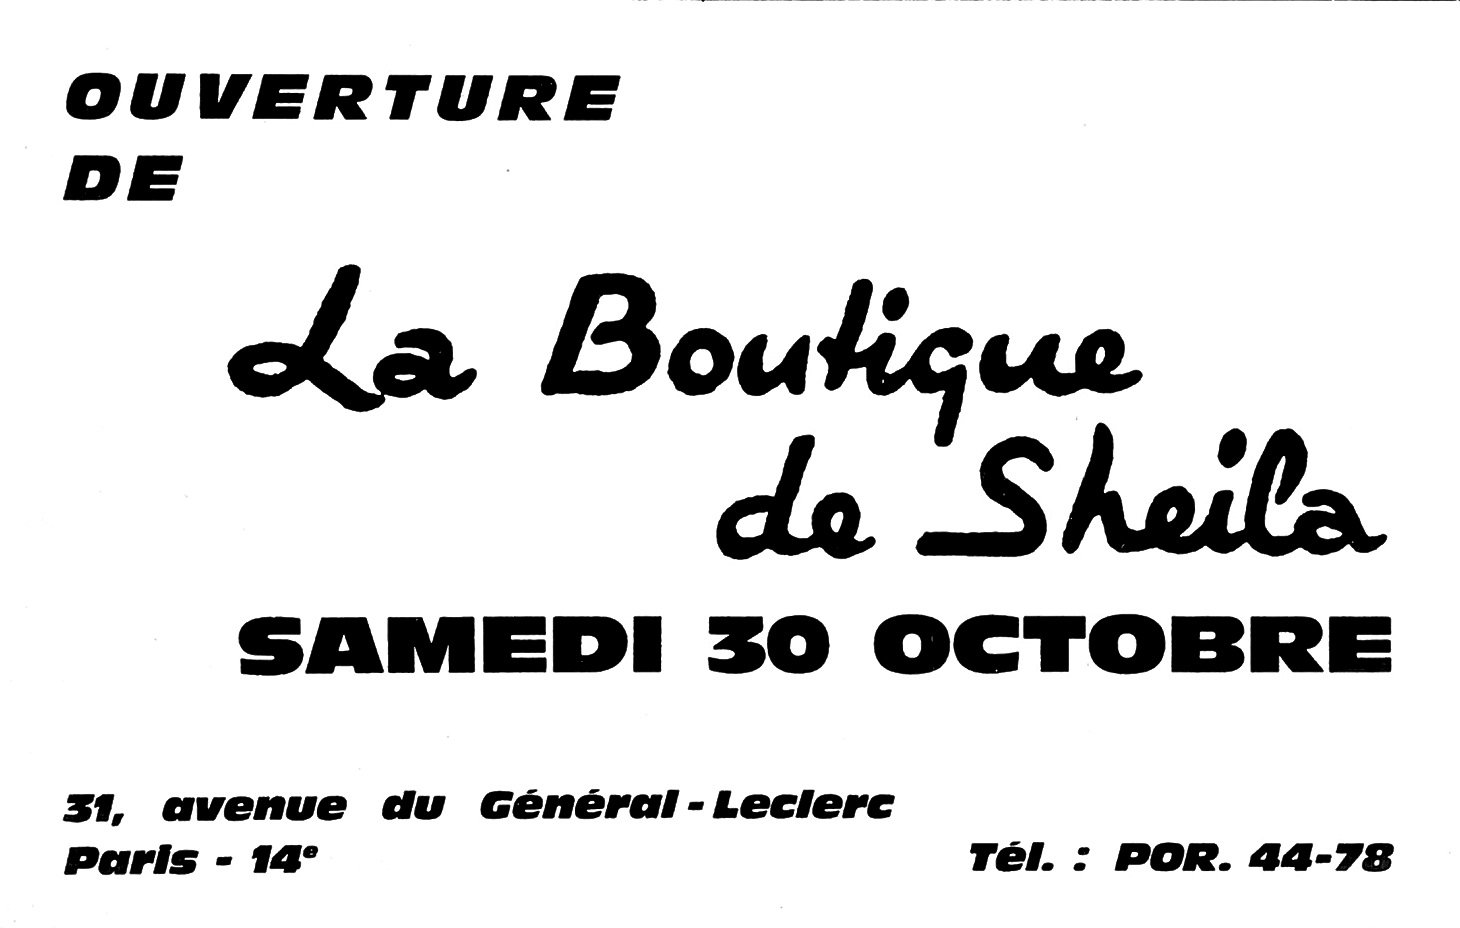 00-1965-11